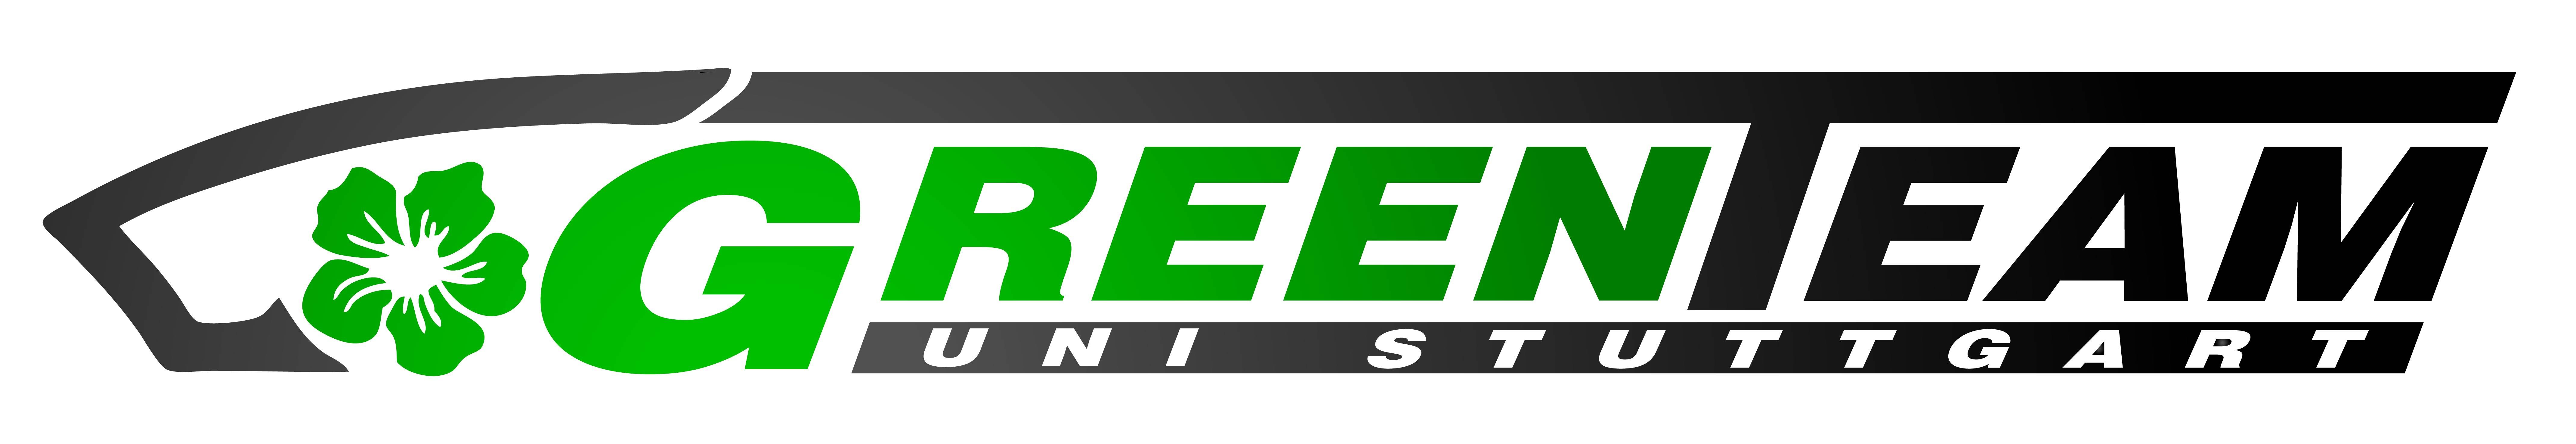 Copyright Greenteam Uni Stuttgart e.V.